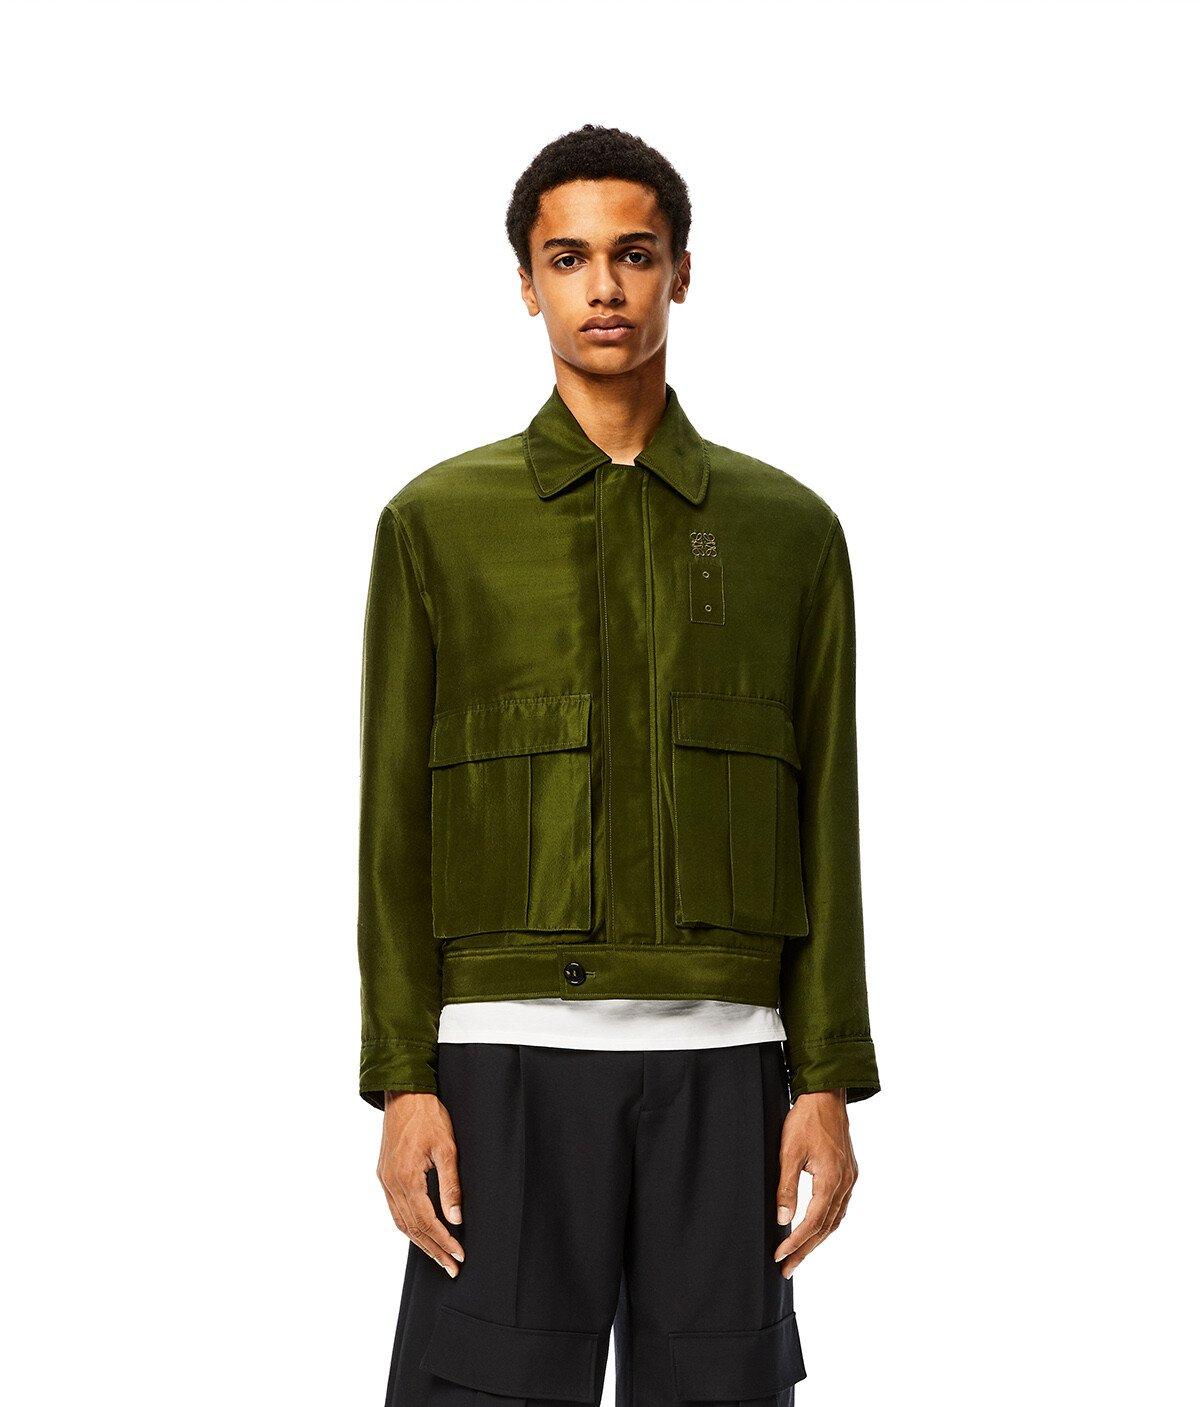 LOEWE Patch Pocket Jacket Khaki Green front